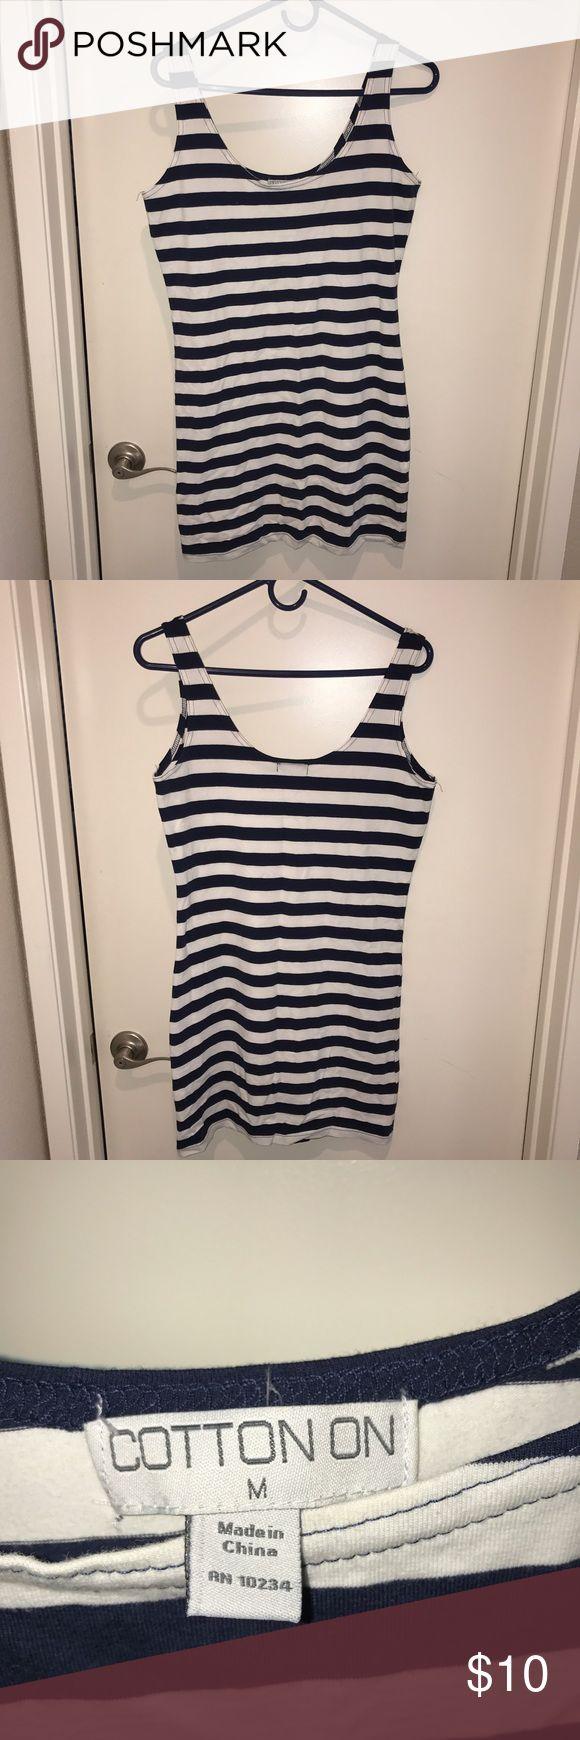 Striped bodycon dress Nautical style striped bodycon dress. Cotton blend. Very stretchy. Never worn! Fits true to size.  CottonOn Dresses Mini